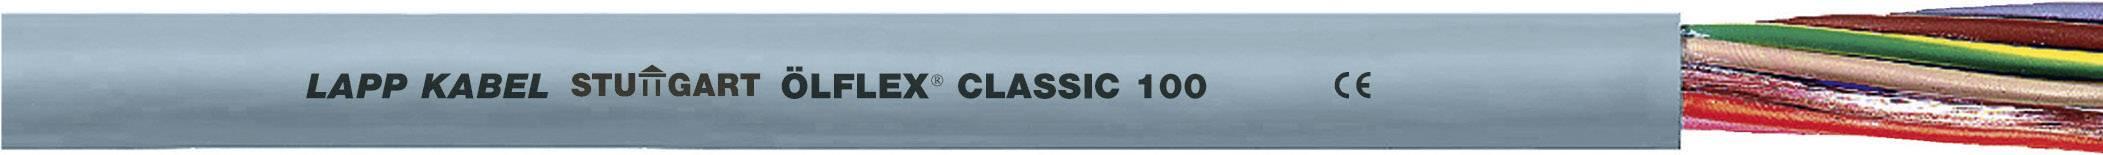 Kabel LappKabel Ölflex CLASSIC 100 10G0,5 (0010007), PVC, 8,6 mm, 500 V, šedá, 50 m